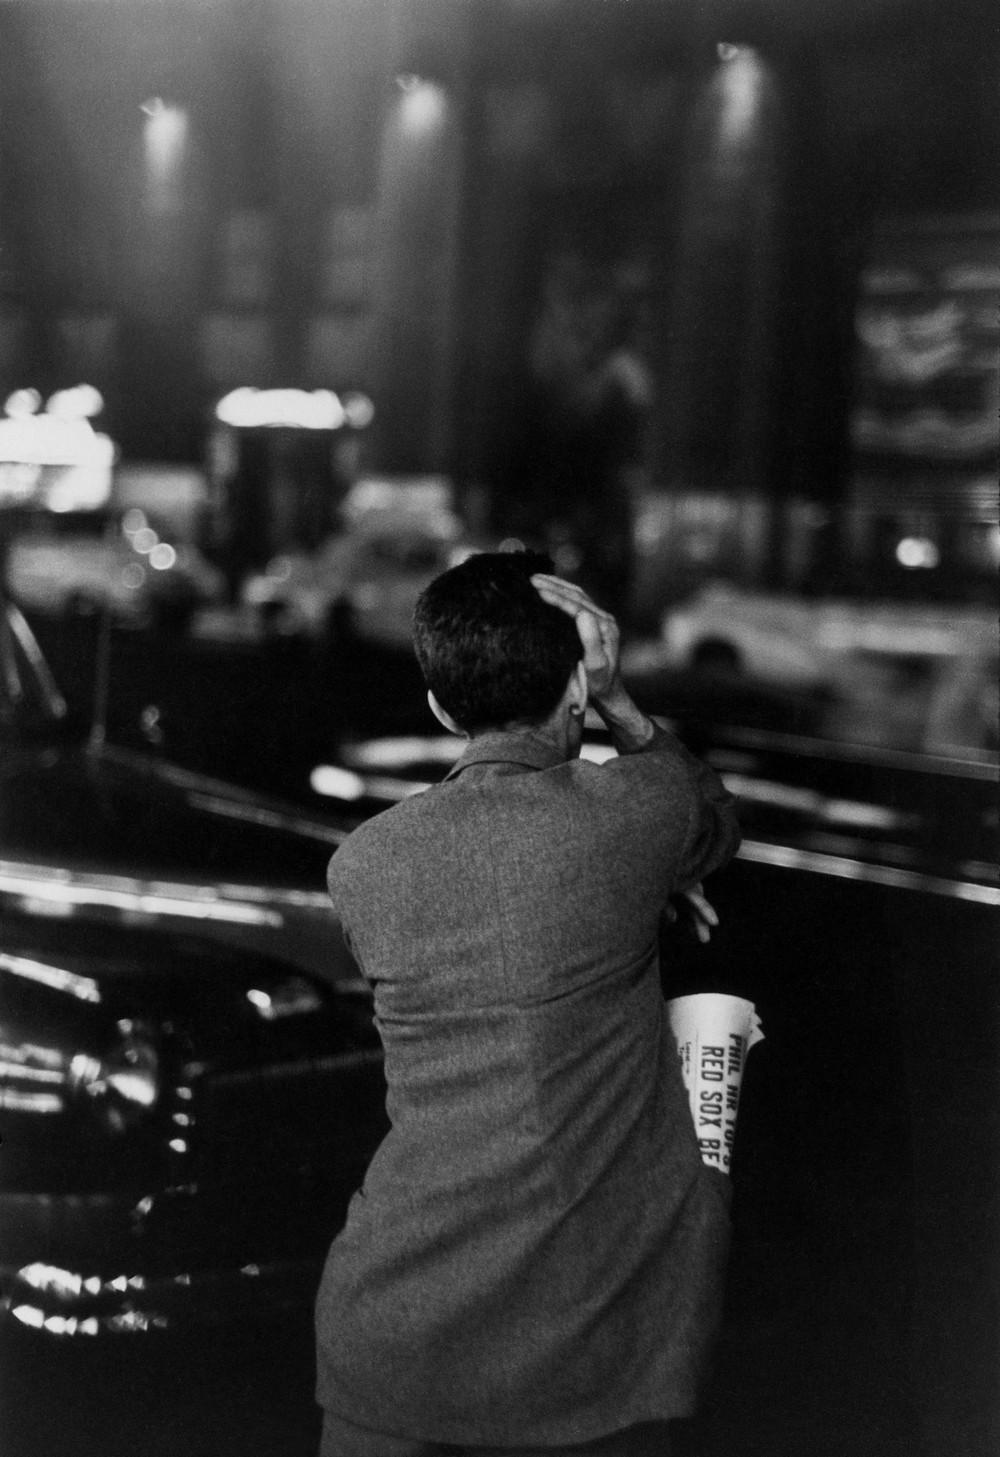 Луи Фаурер – лирик с фотокамерой на улицах Нью-Йорка 17